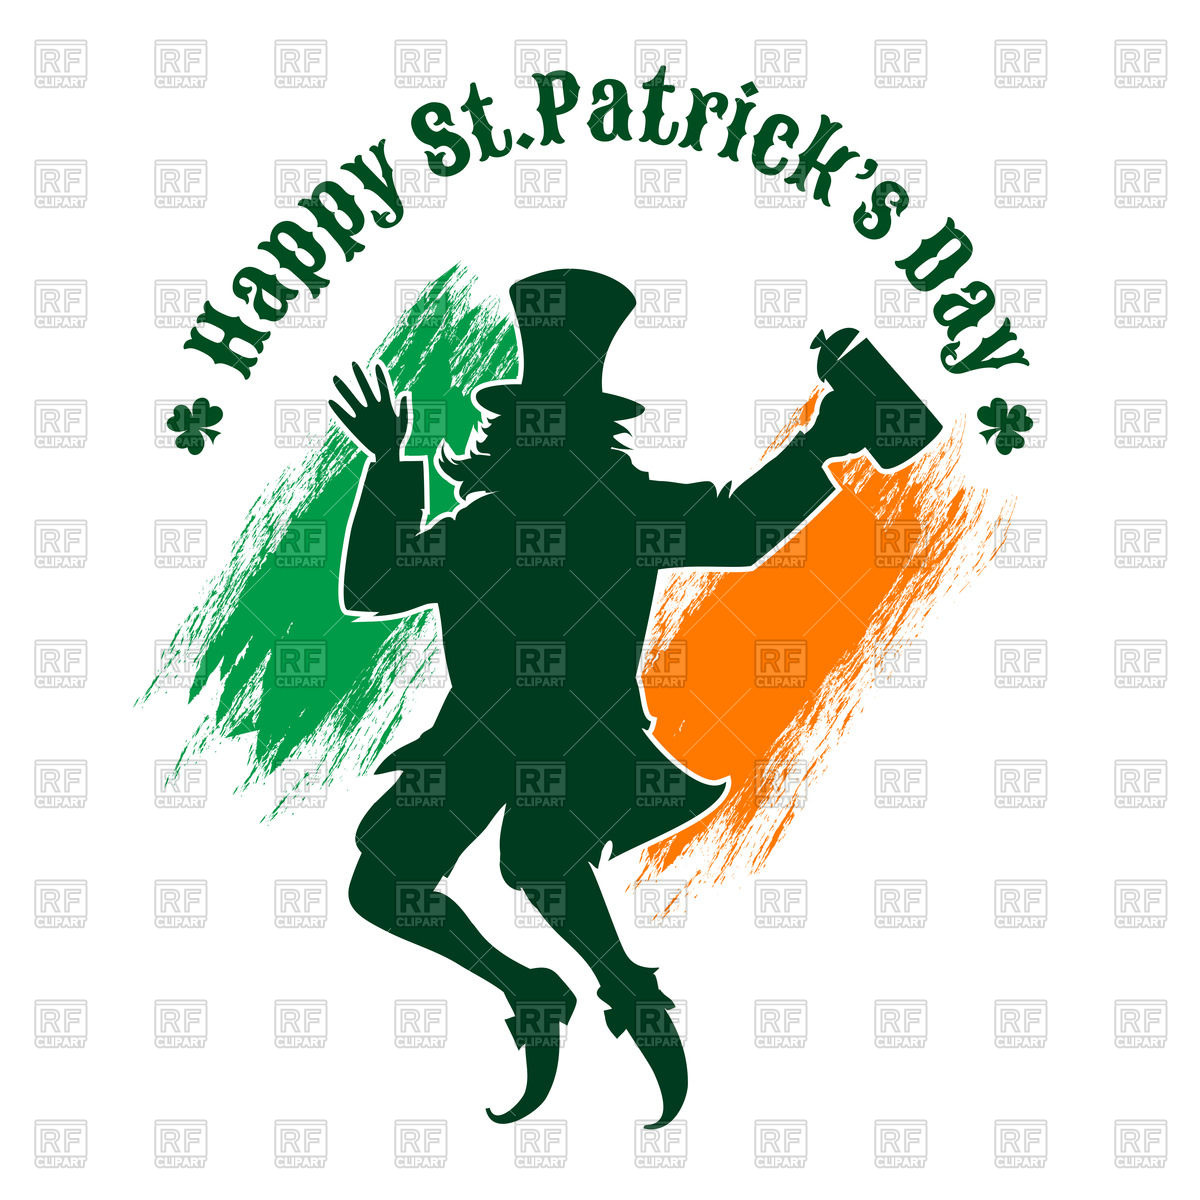 1200x1200 St. Patrick's Day Poster With Silhouette Of Joyful Leprechaun